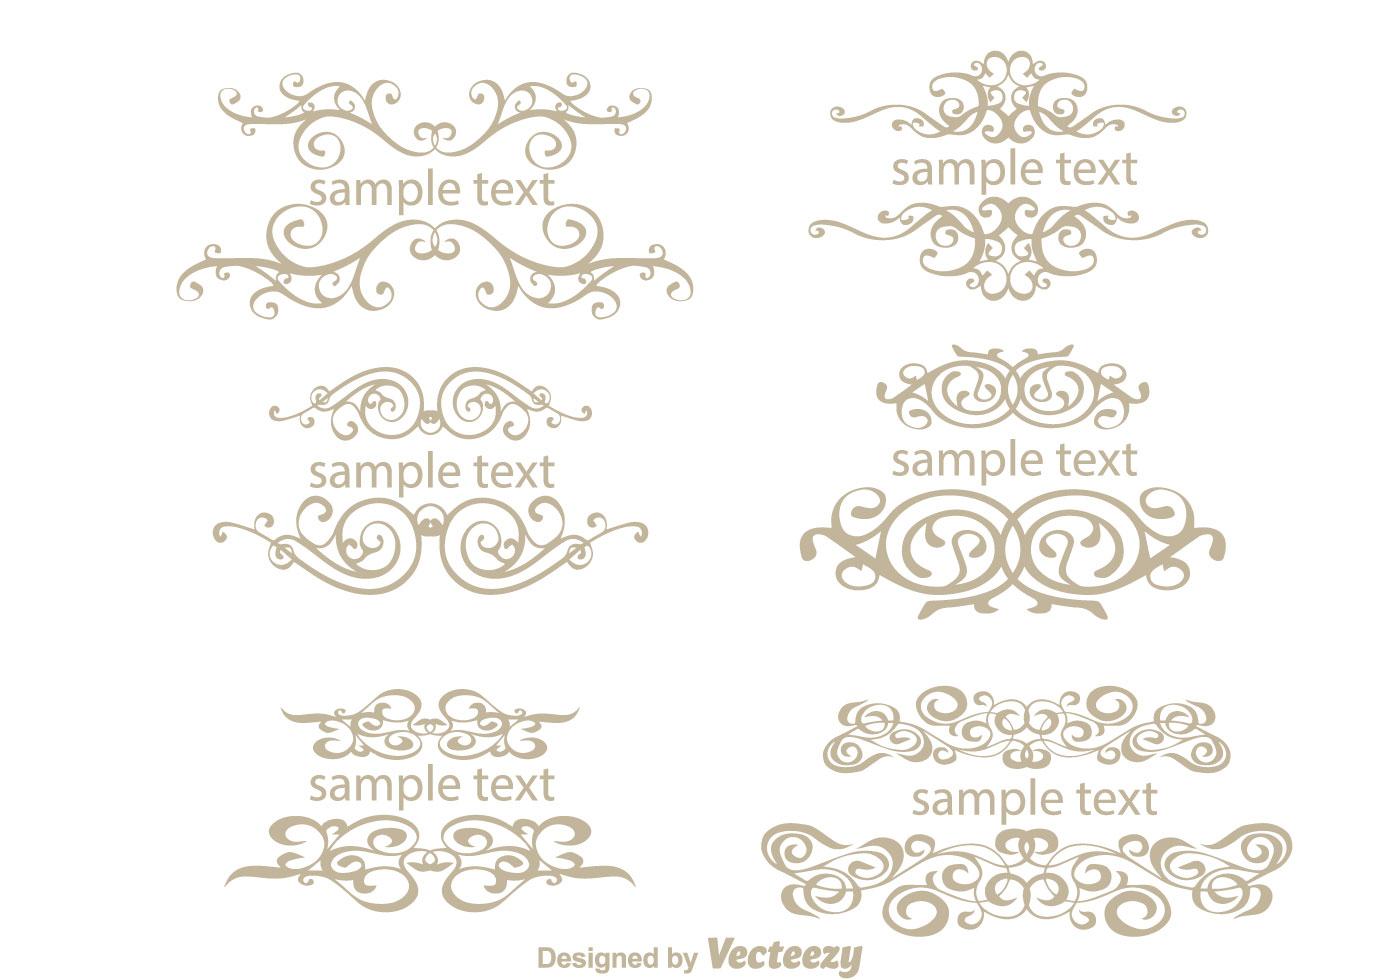 Text Ornamanet Fancy Lines Vectors - Download Free Vector ...  Text Ornamanet ...